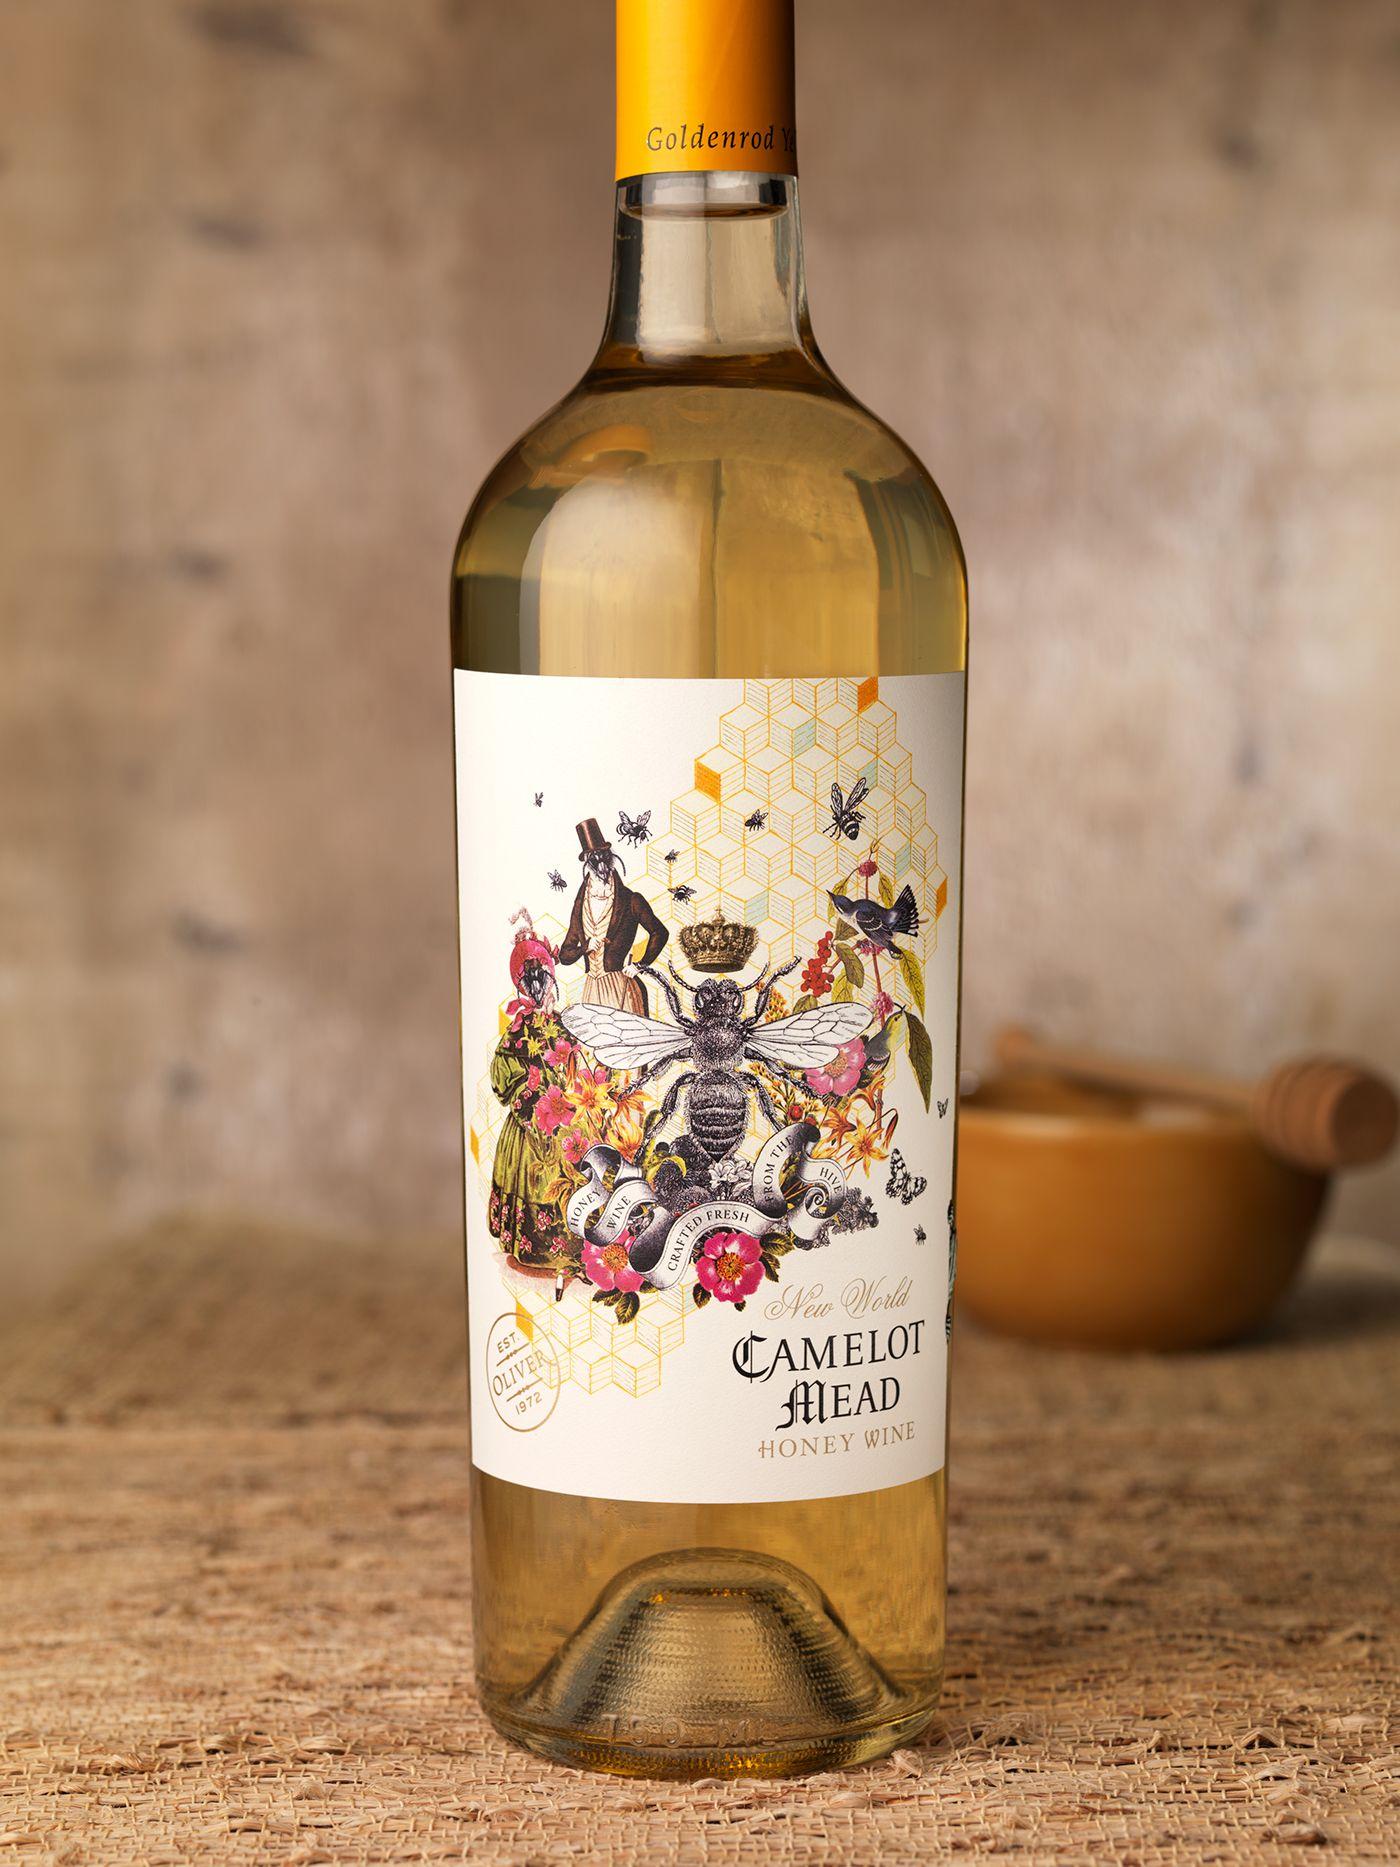 Camelot Mead Honey Wine Label Packaging Design On Behance Wine Bottle Label Design Mead Wine Honey Wine